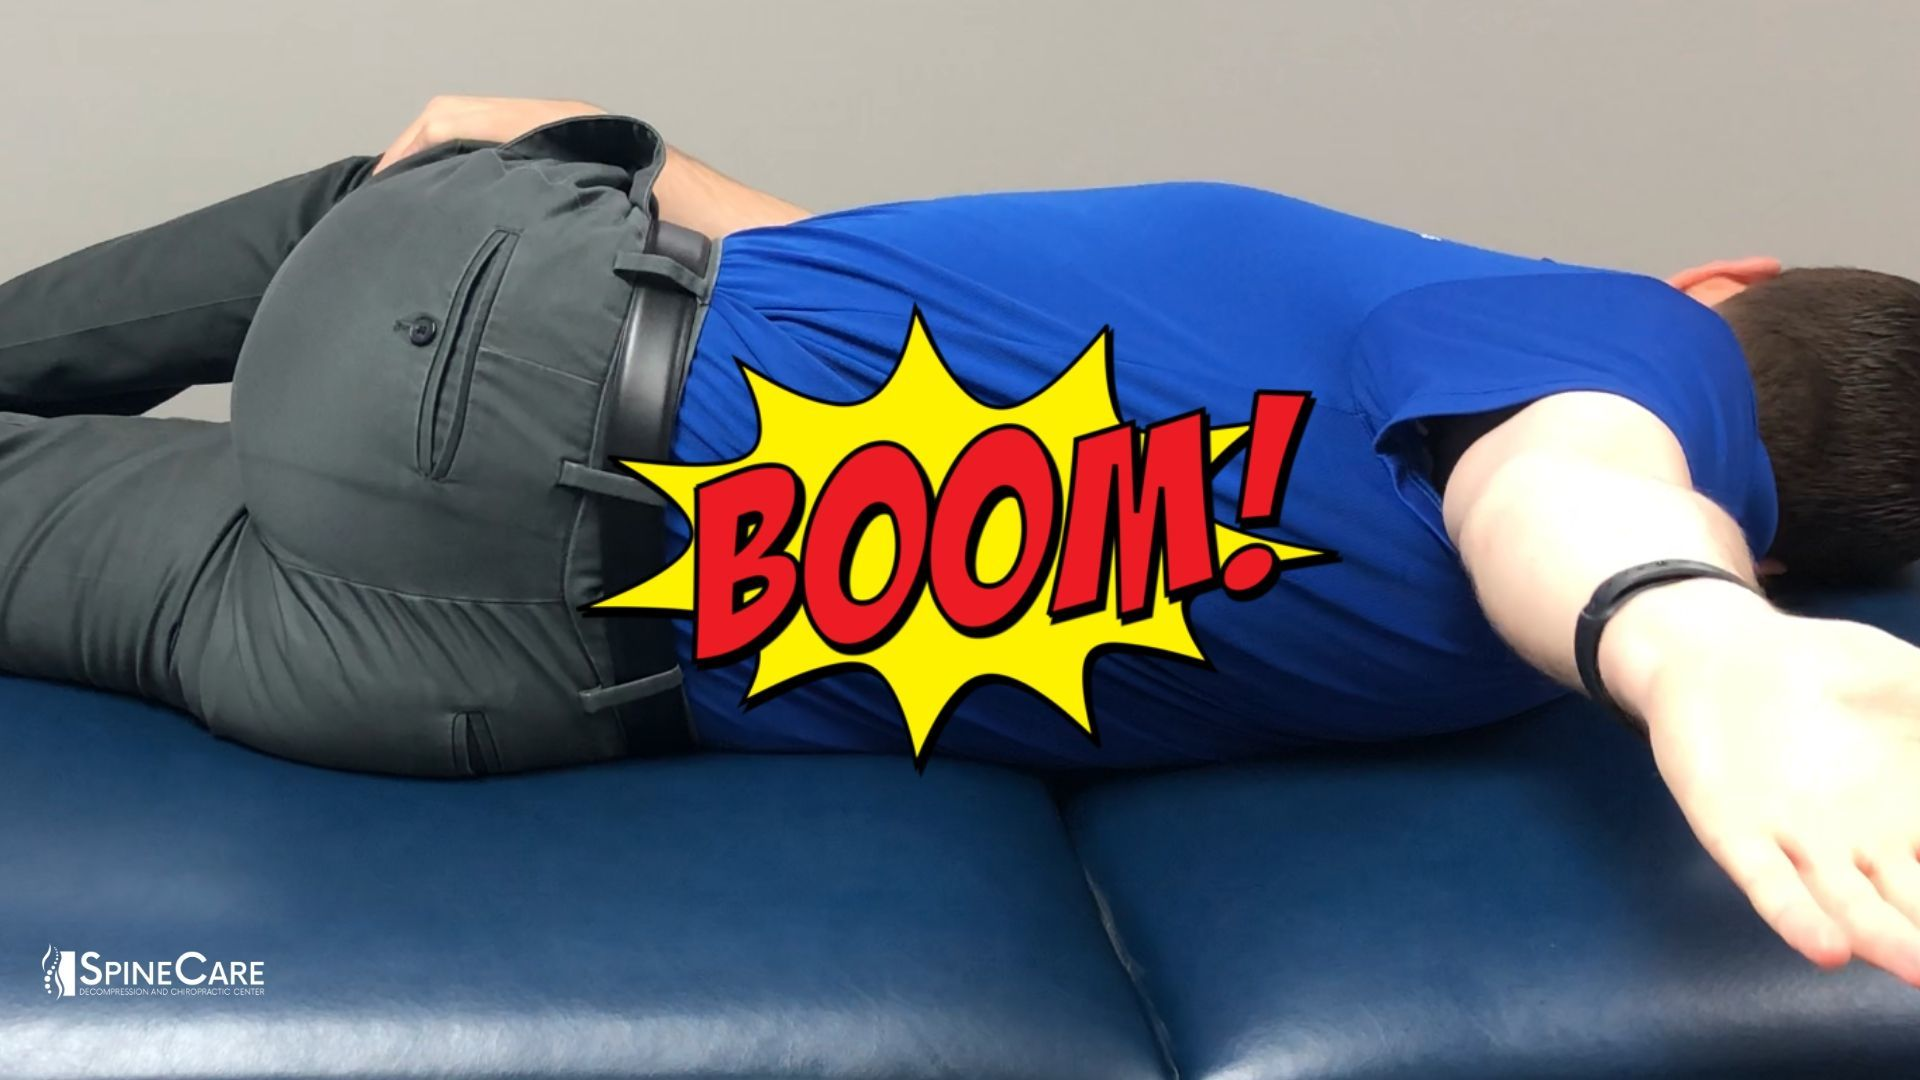 SAFE lower back mobilization stretch | St. Joseph, MI chiropractor SpineCare